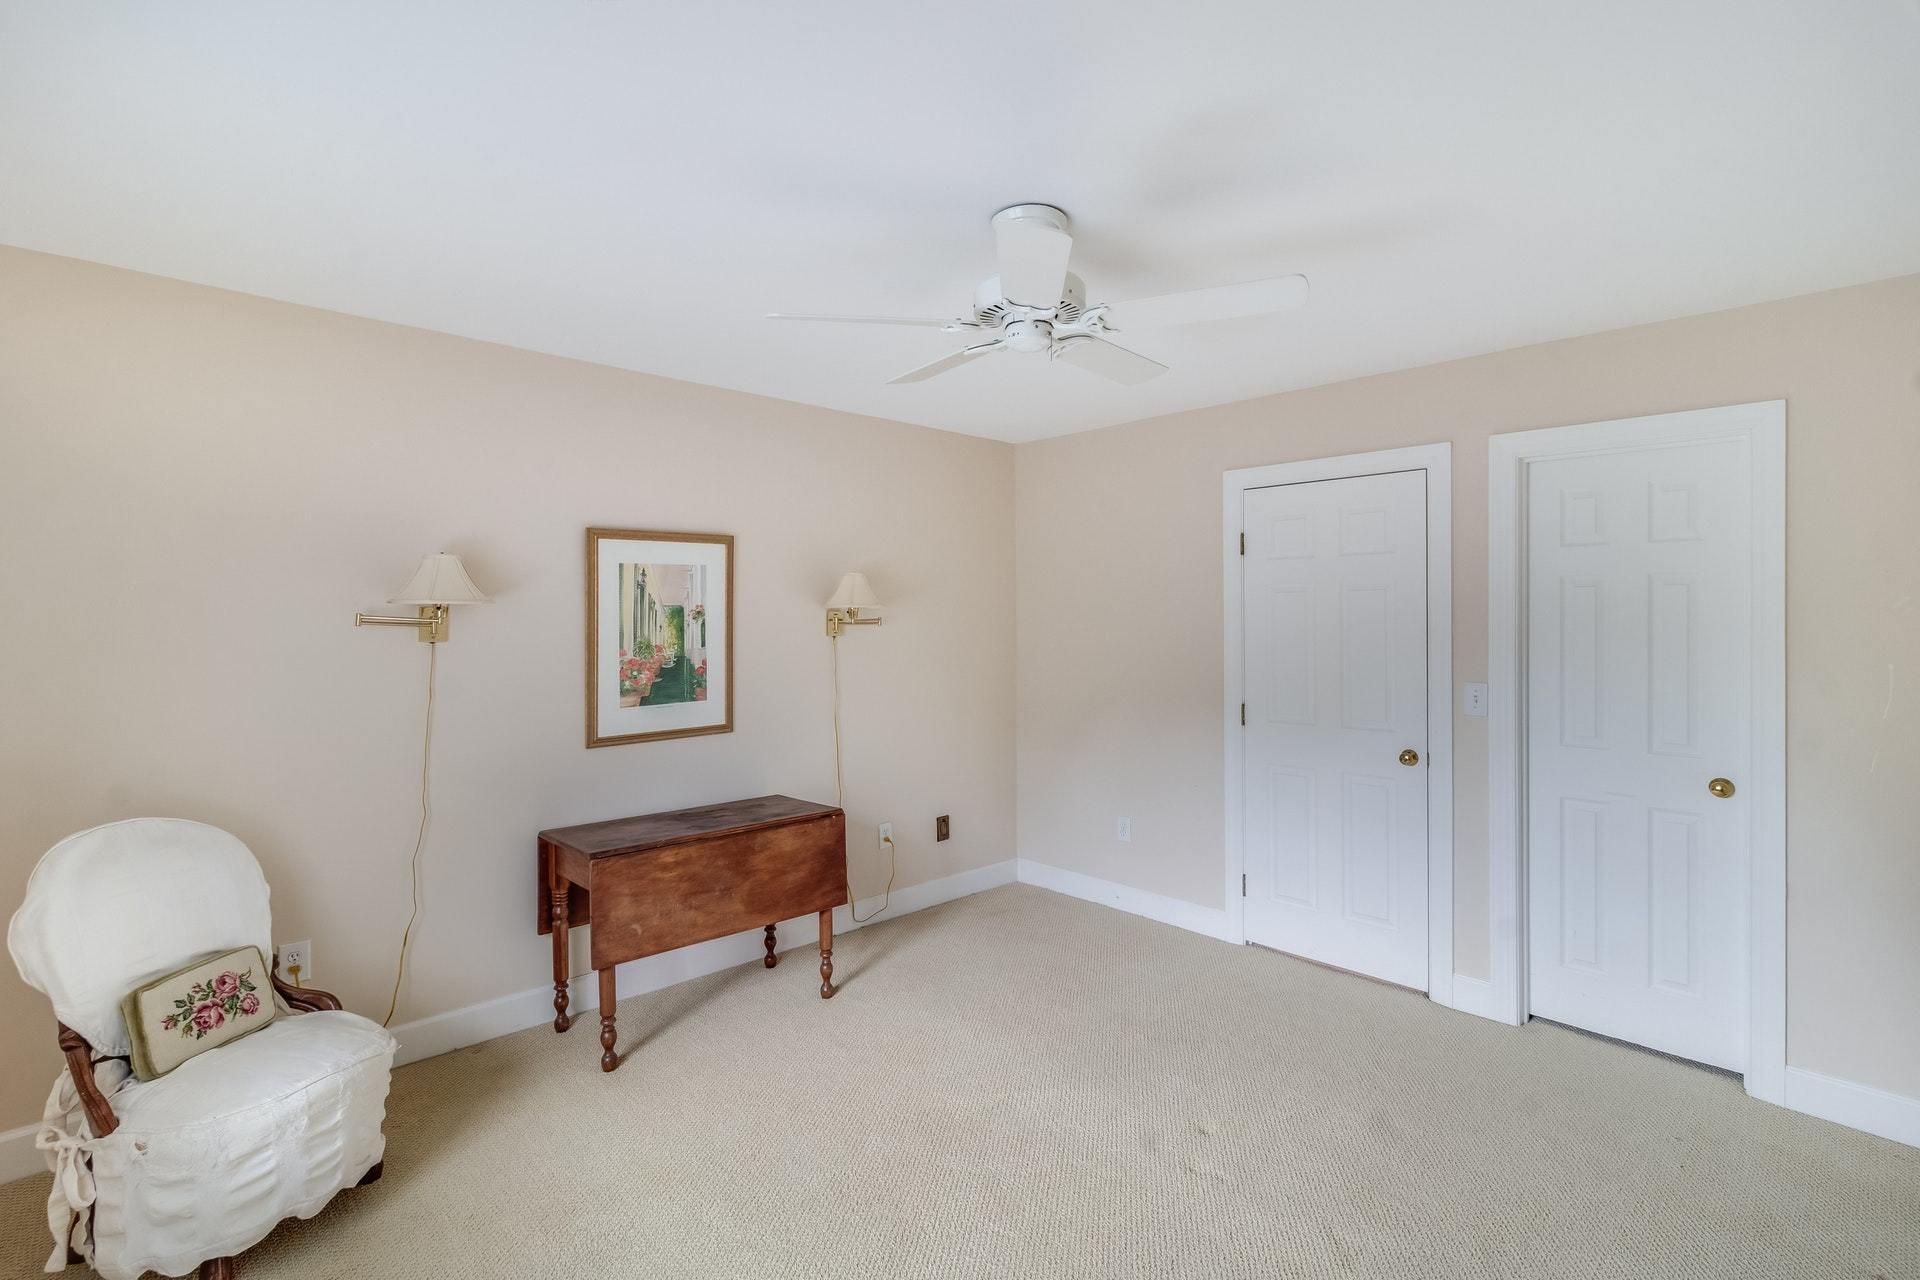 Molasses Creek Homes For Sale - 396 Sirop, Mount Pleasant, SC - 22